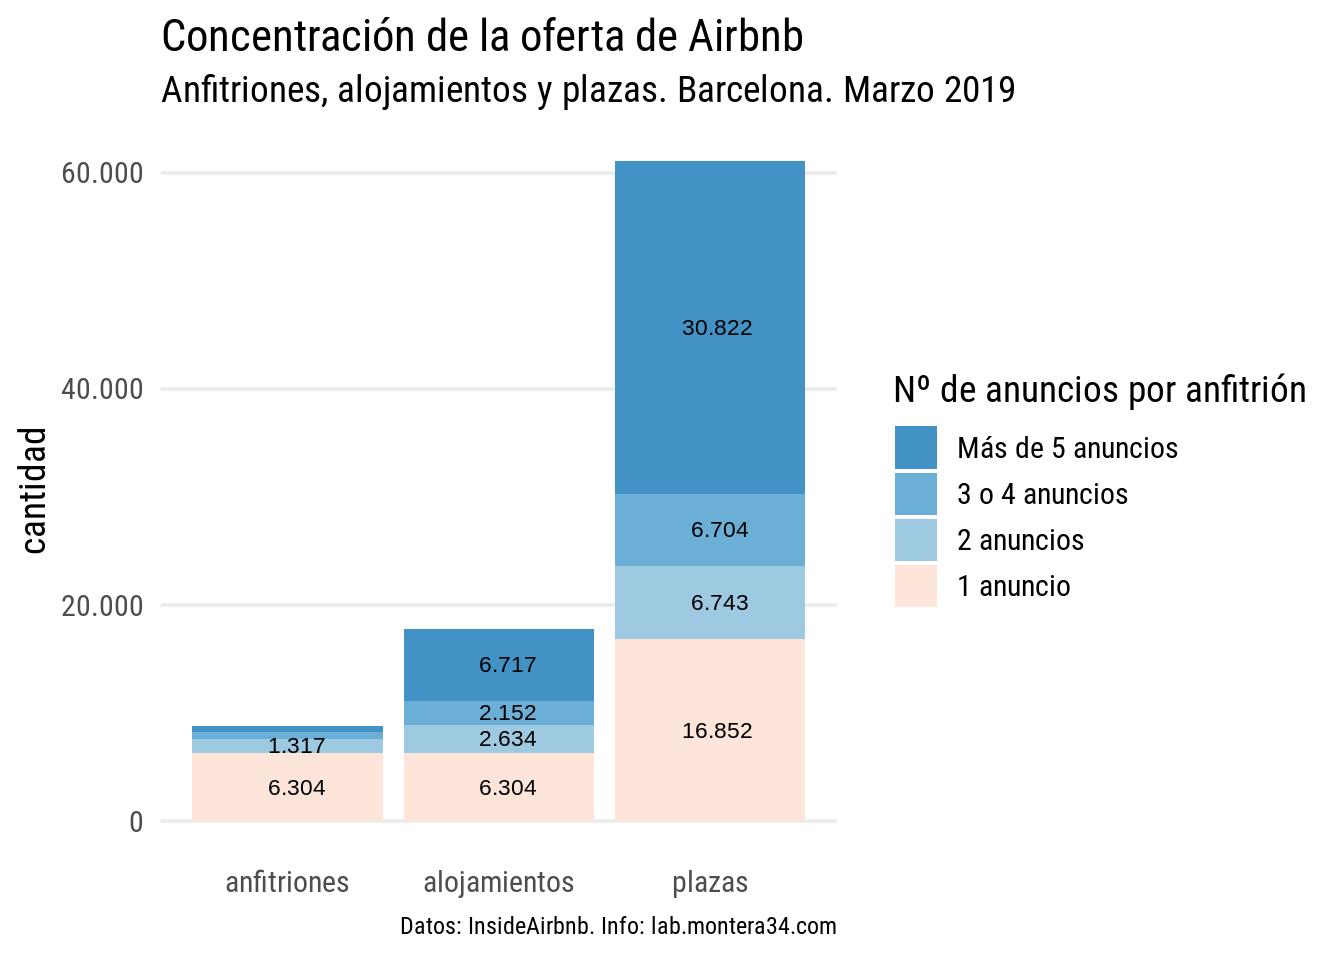 static/images/barcelona/hosts/concentracion-oferta-airbnb-barcelona-201903.png